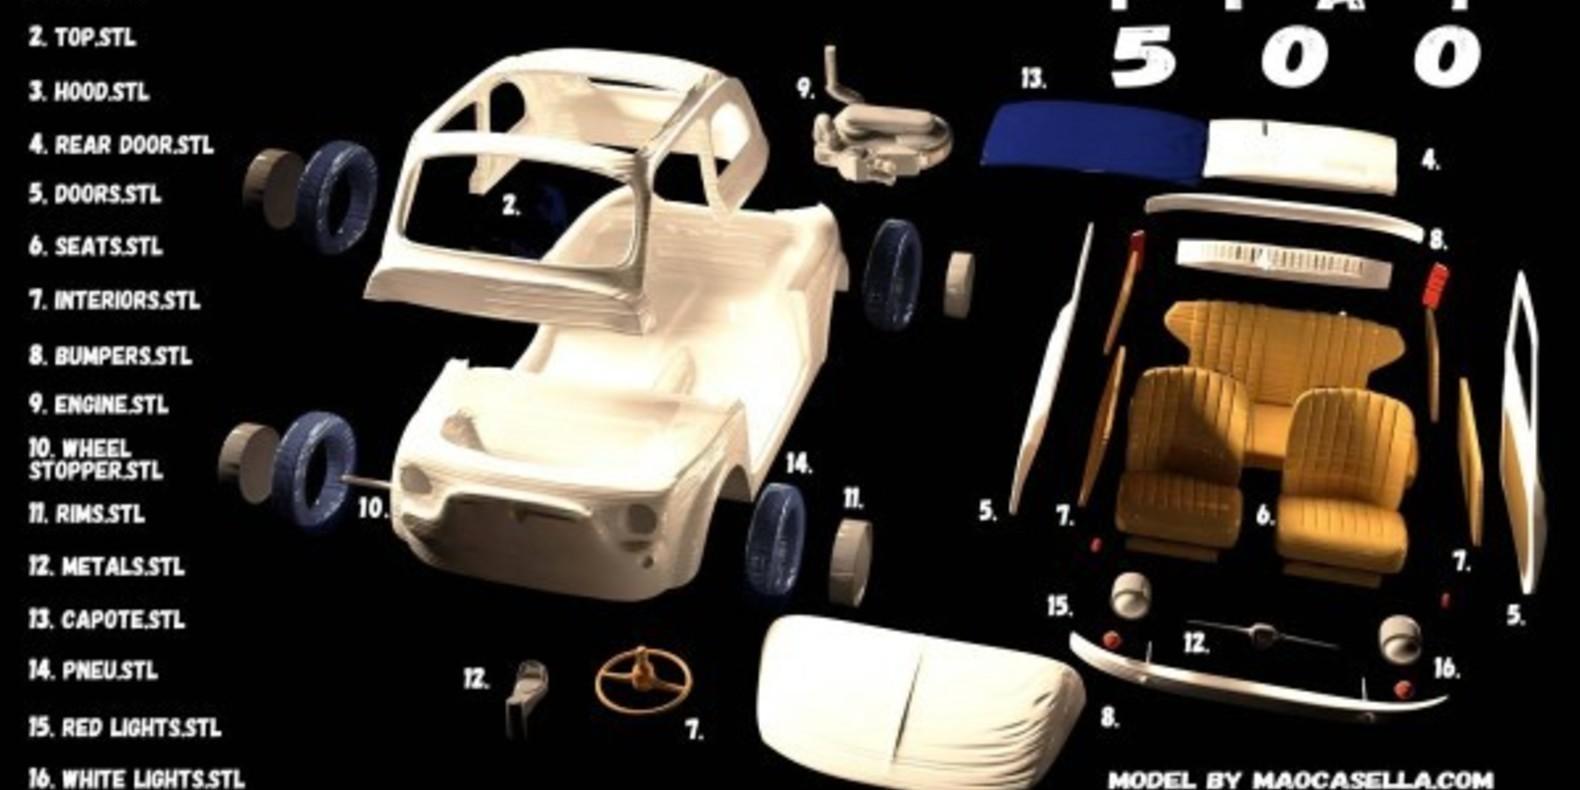 Italian Sixties Car 5 - Mao Casella - Cults modélisme 3D printing Impression 3D Fichier 3D